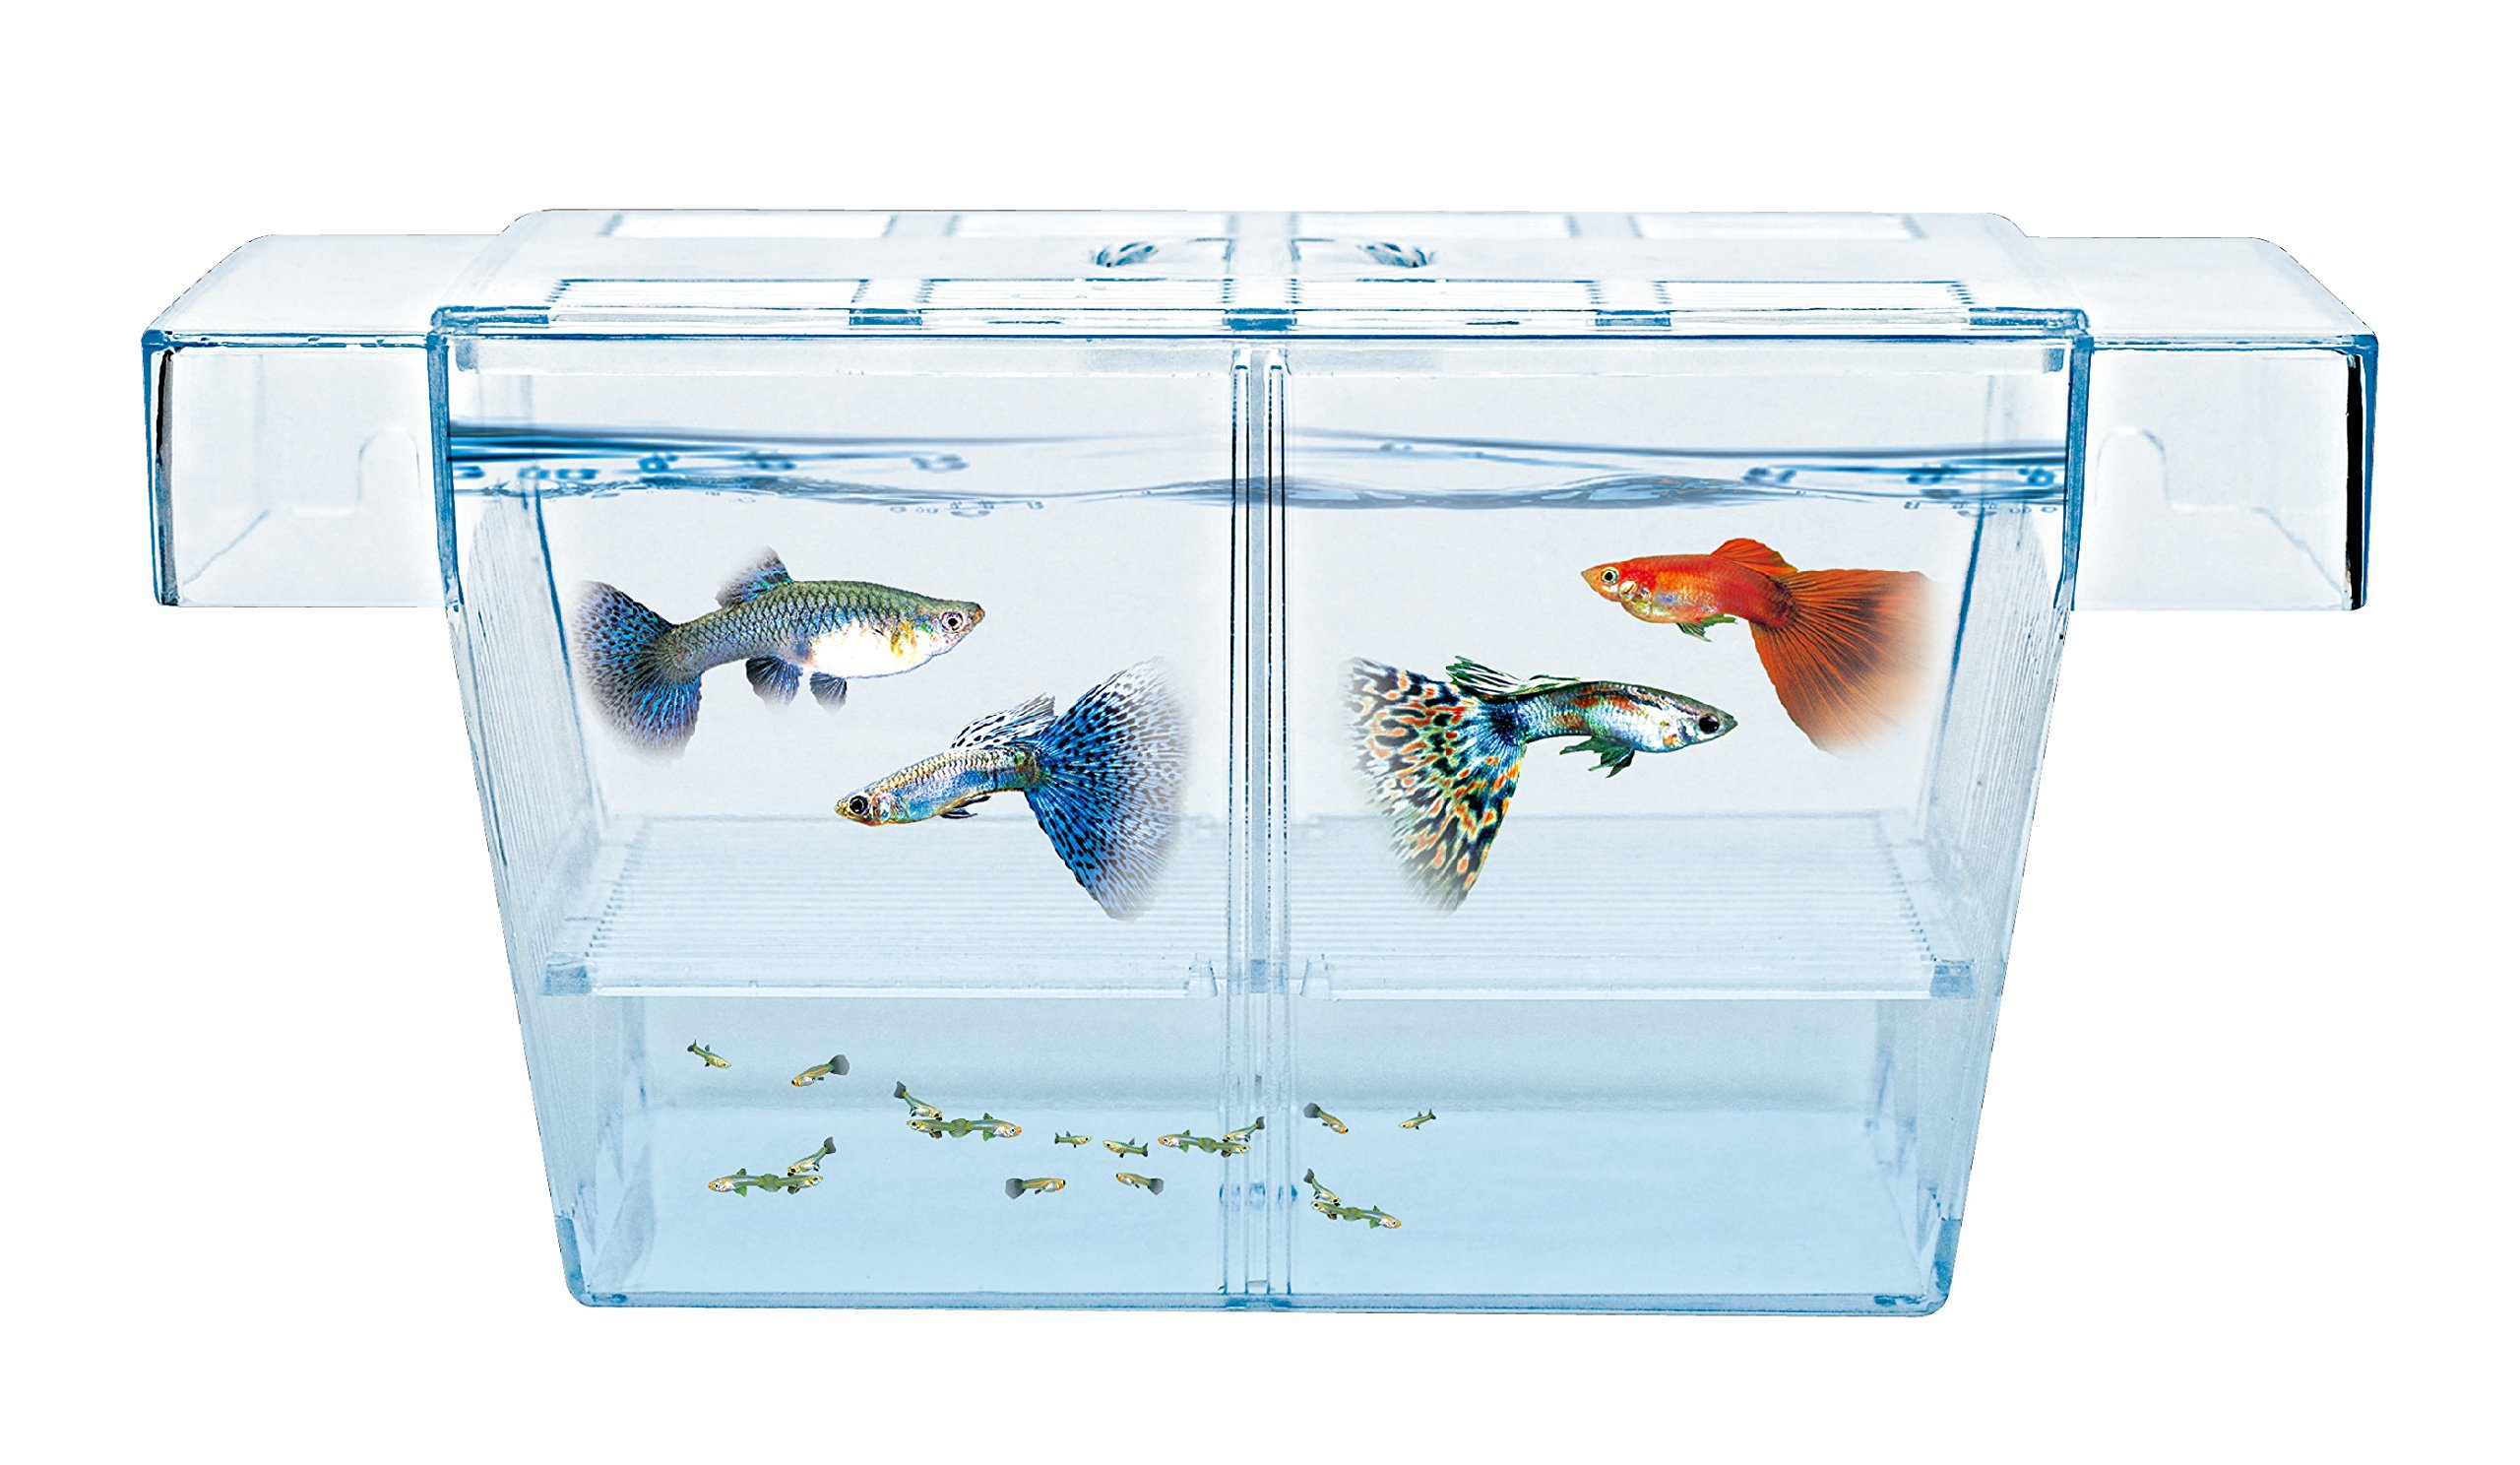 HAQOS Aquarium Fish Tank Breeder Box BX-L by HAQOS